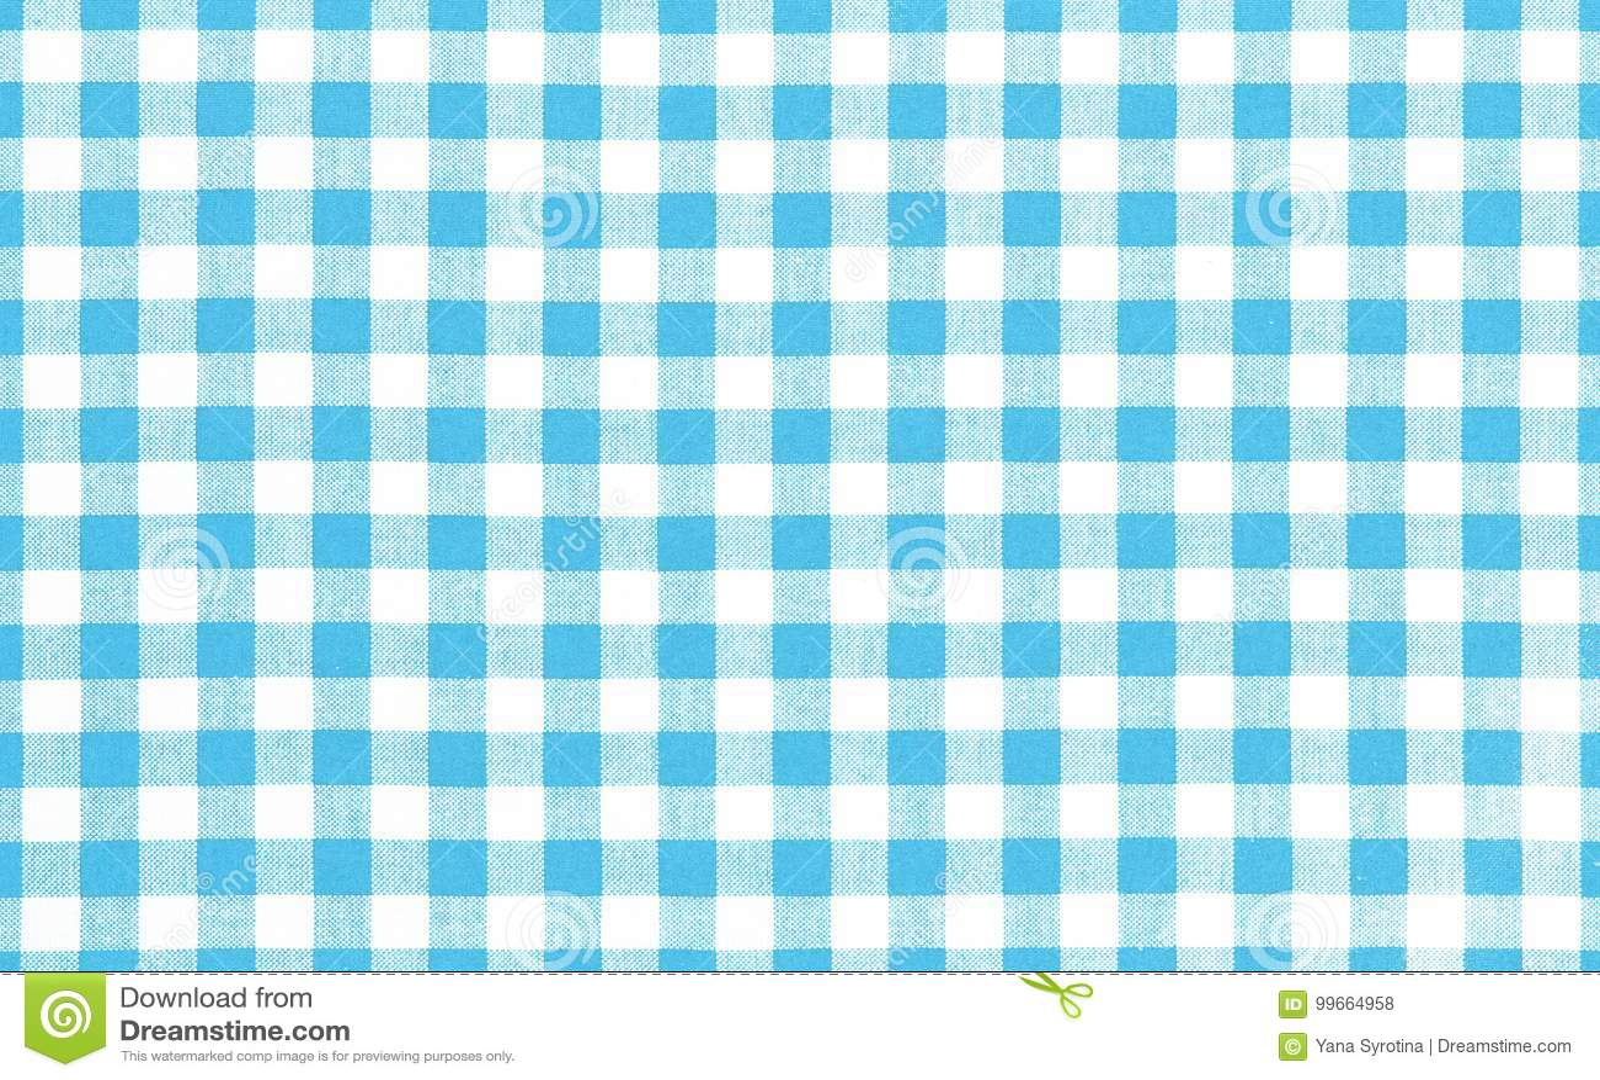 Blue Picnic Cloth Background. Stock Photo - Image of retro, fabric ...